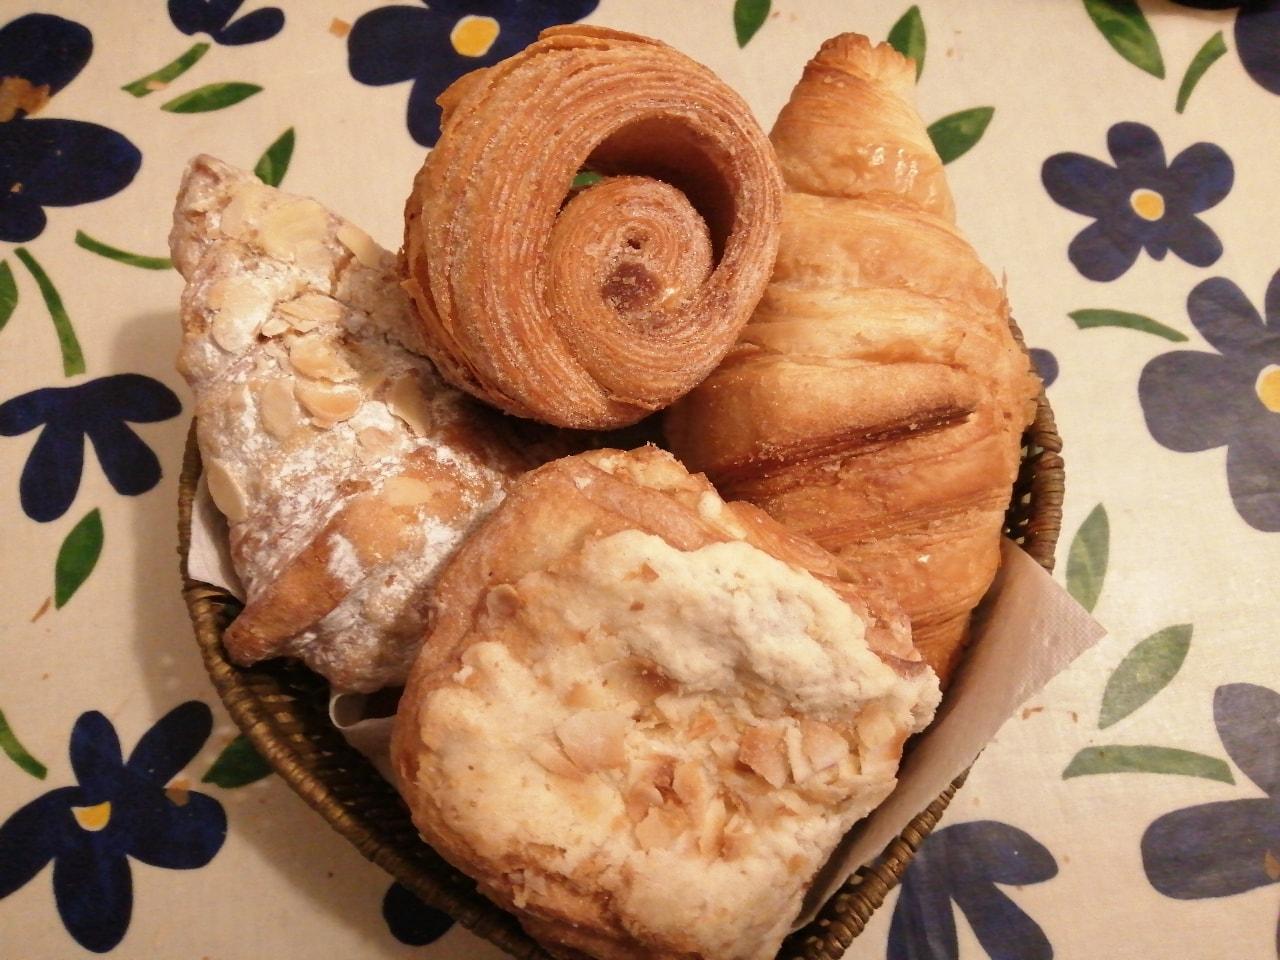 Flourpot pastries (lots today)